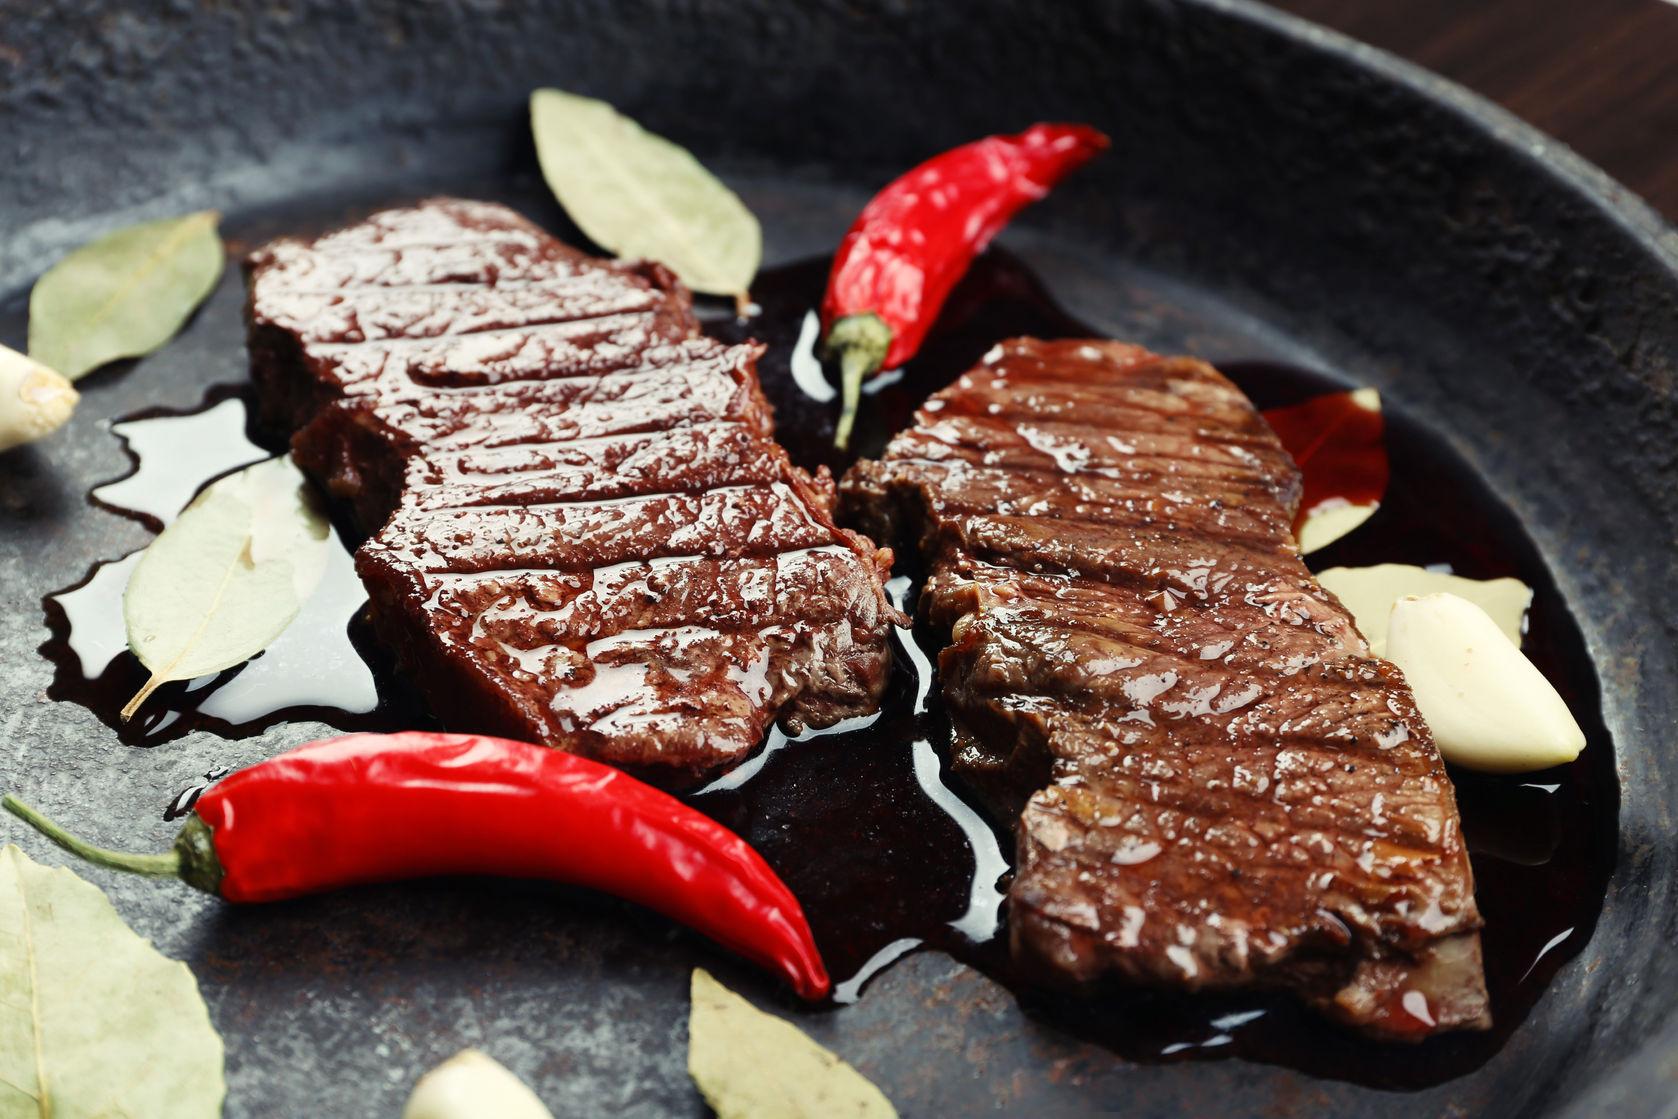 konyhai_alapfogas_steak